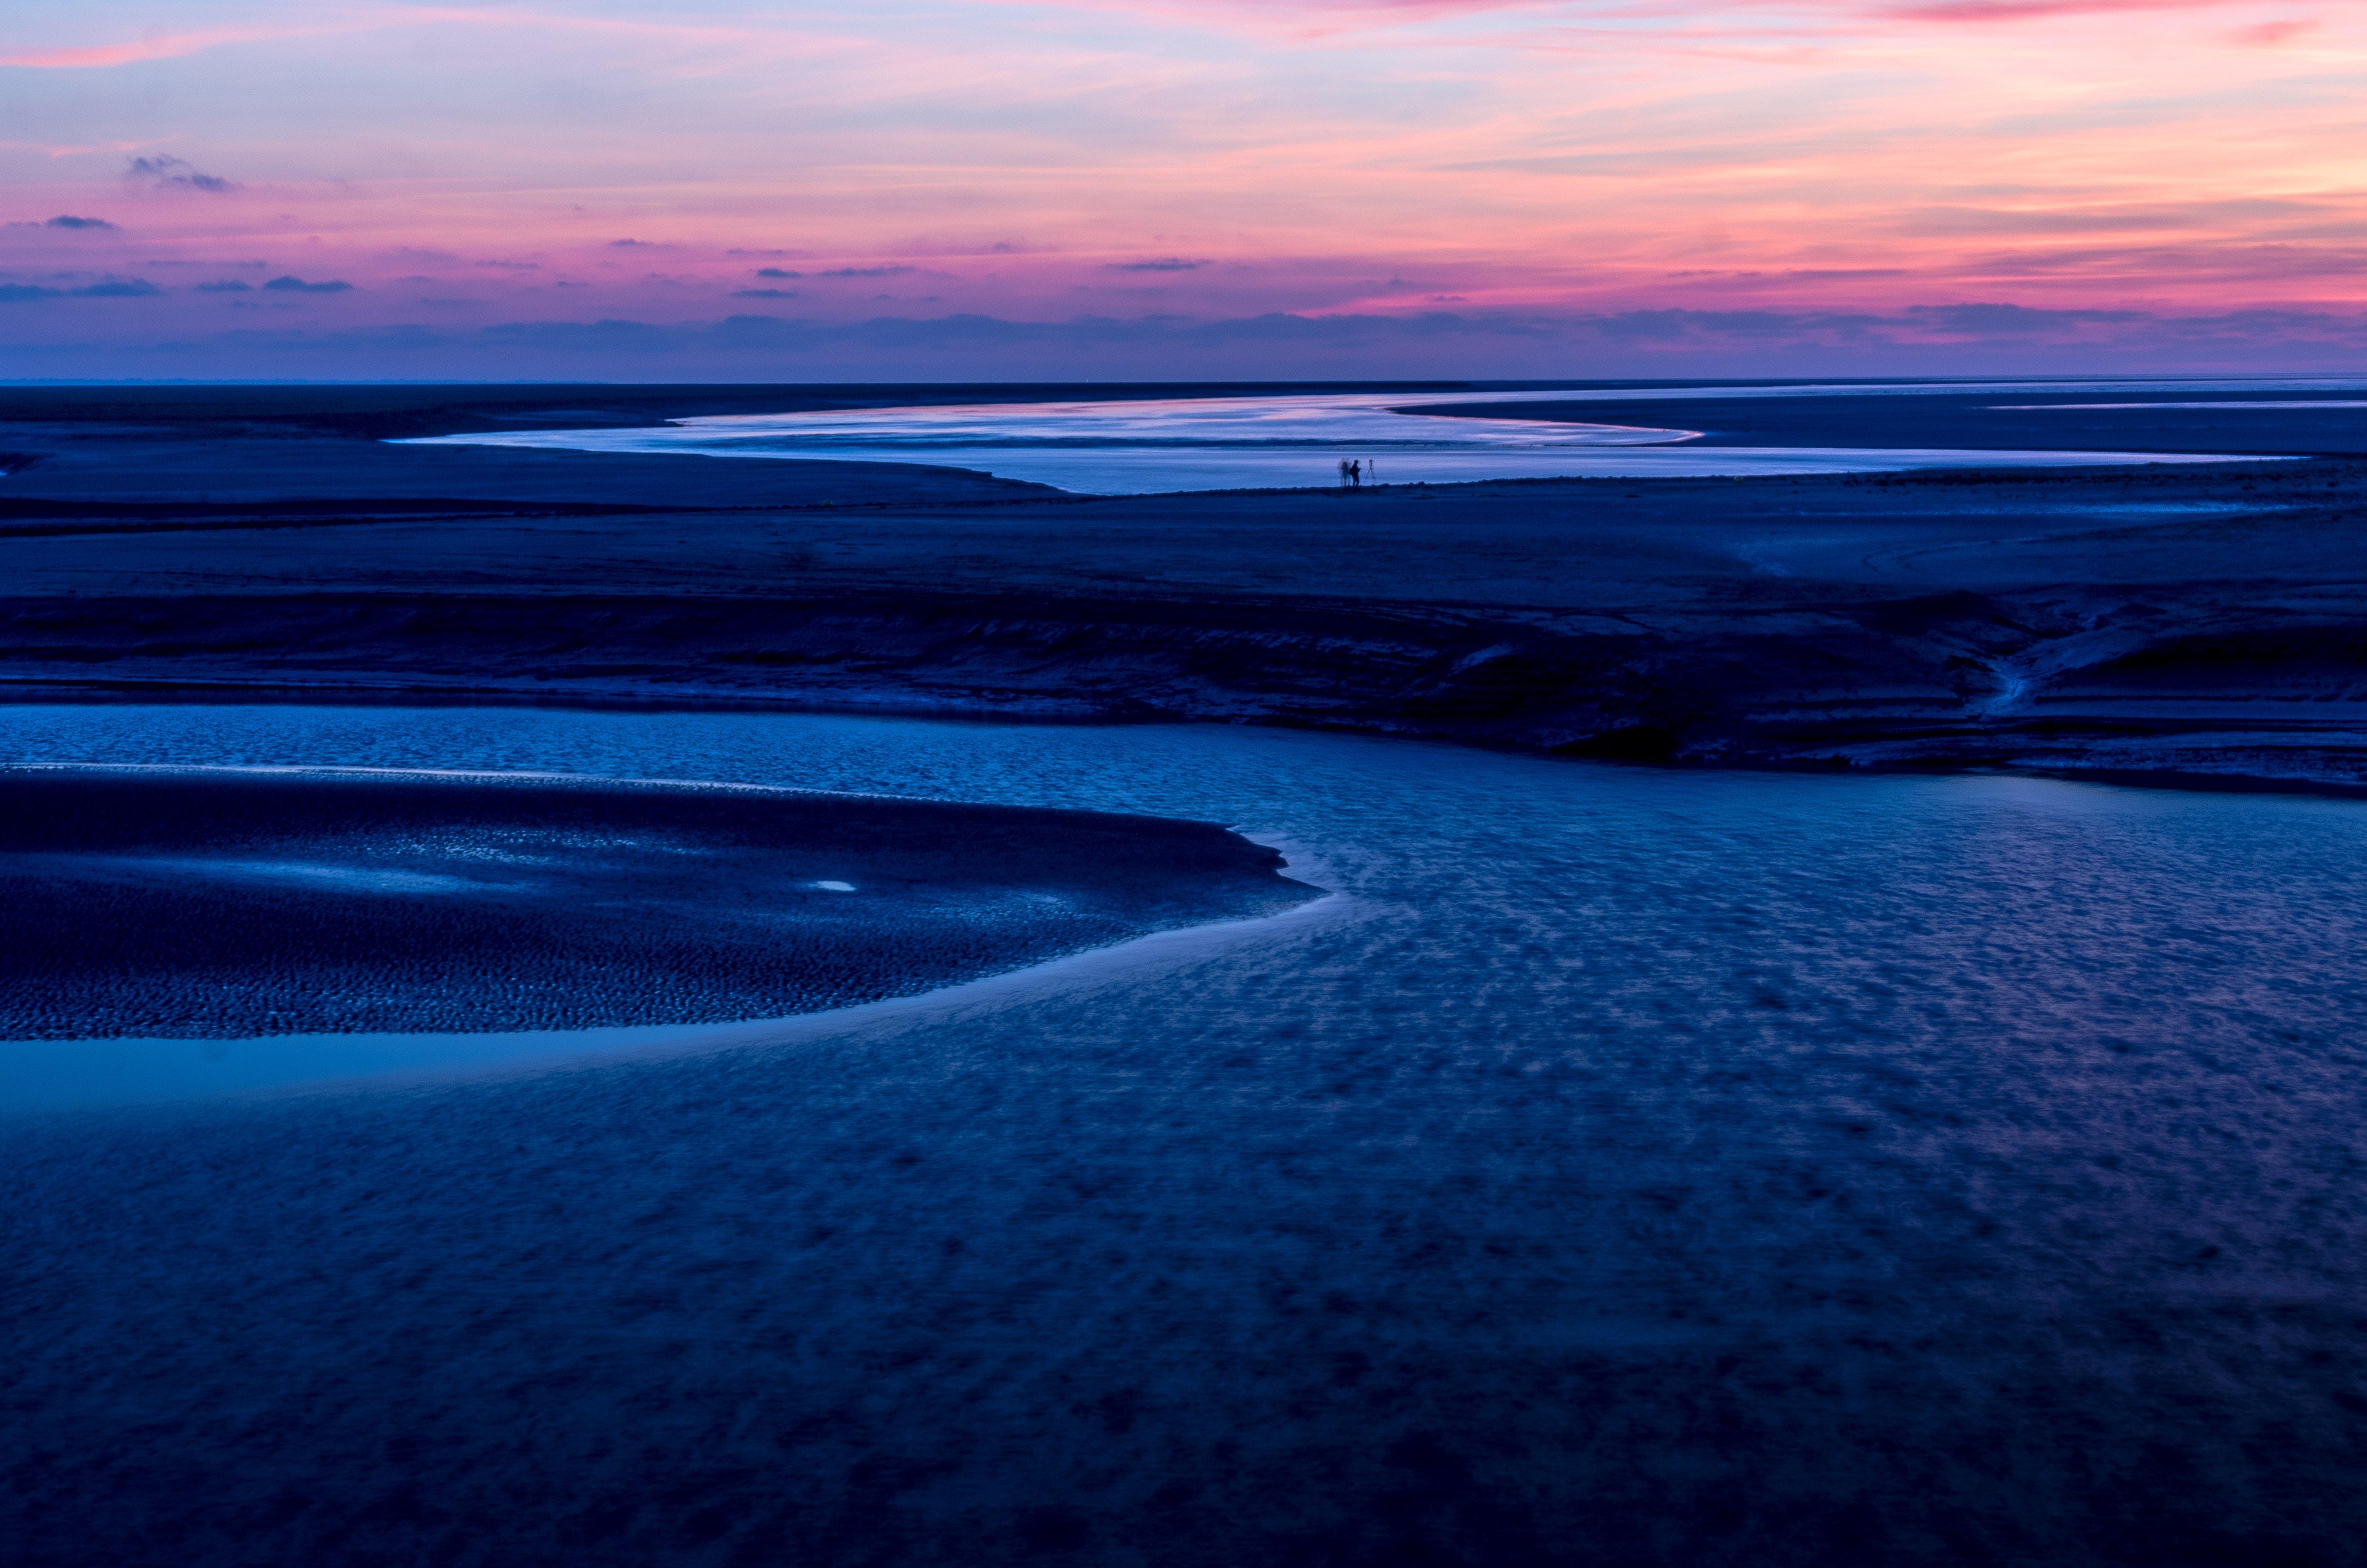 dune near on body of water